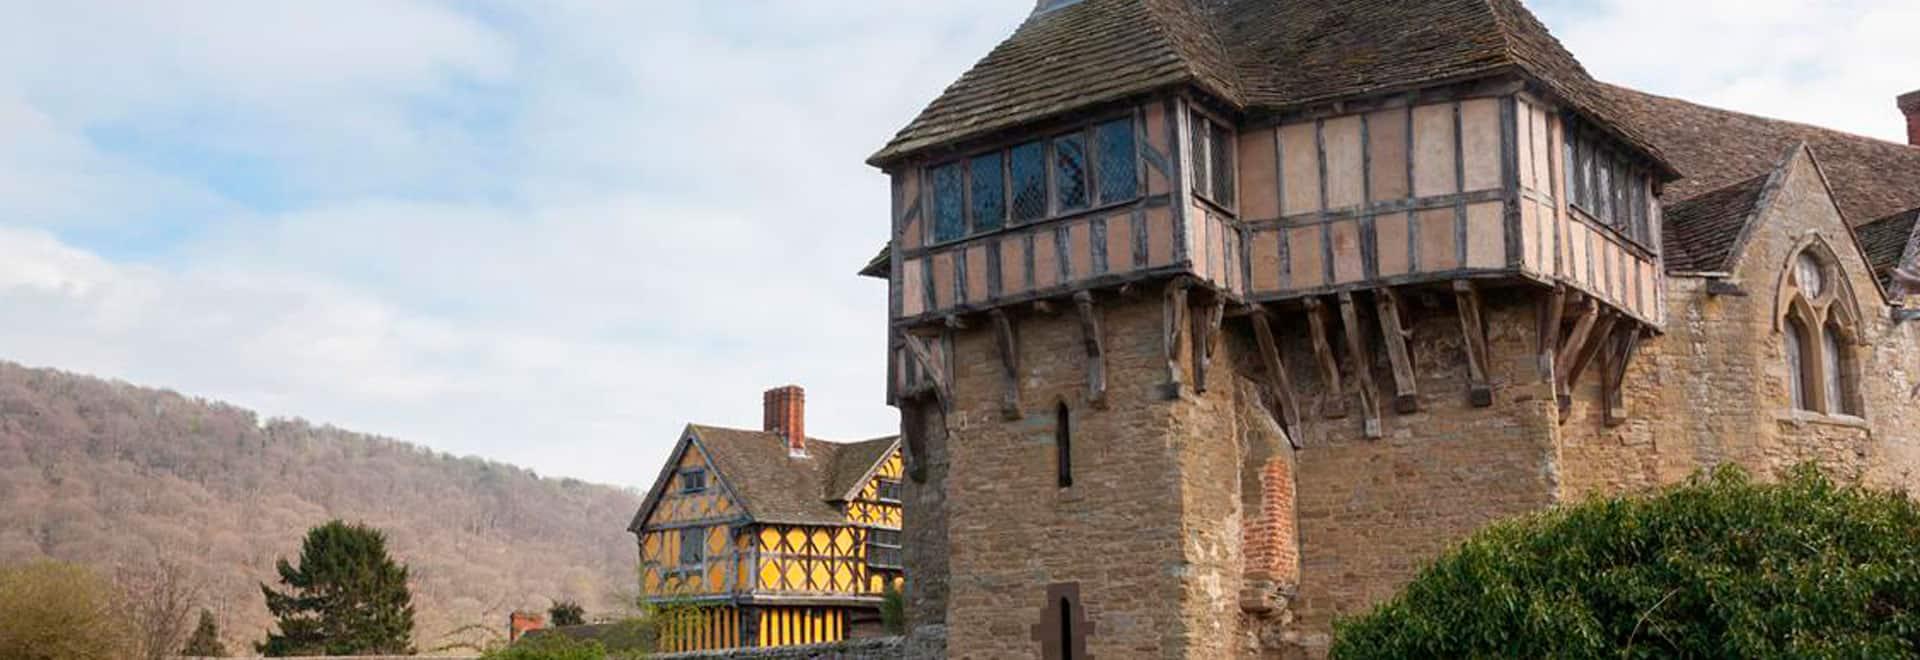 stokesay-castle-Banner-Image